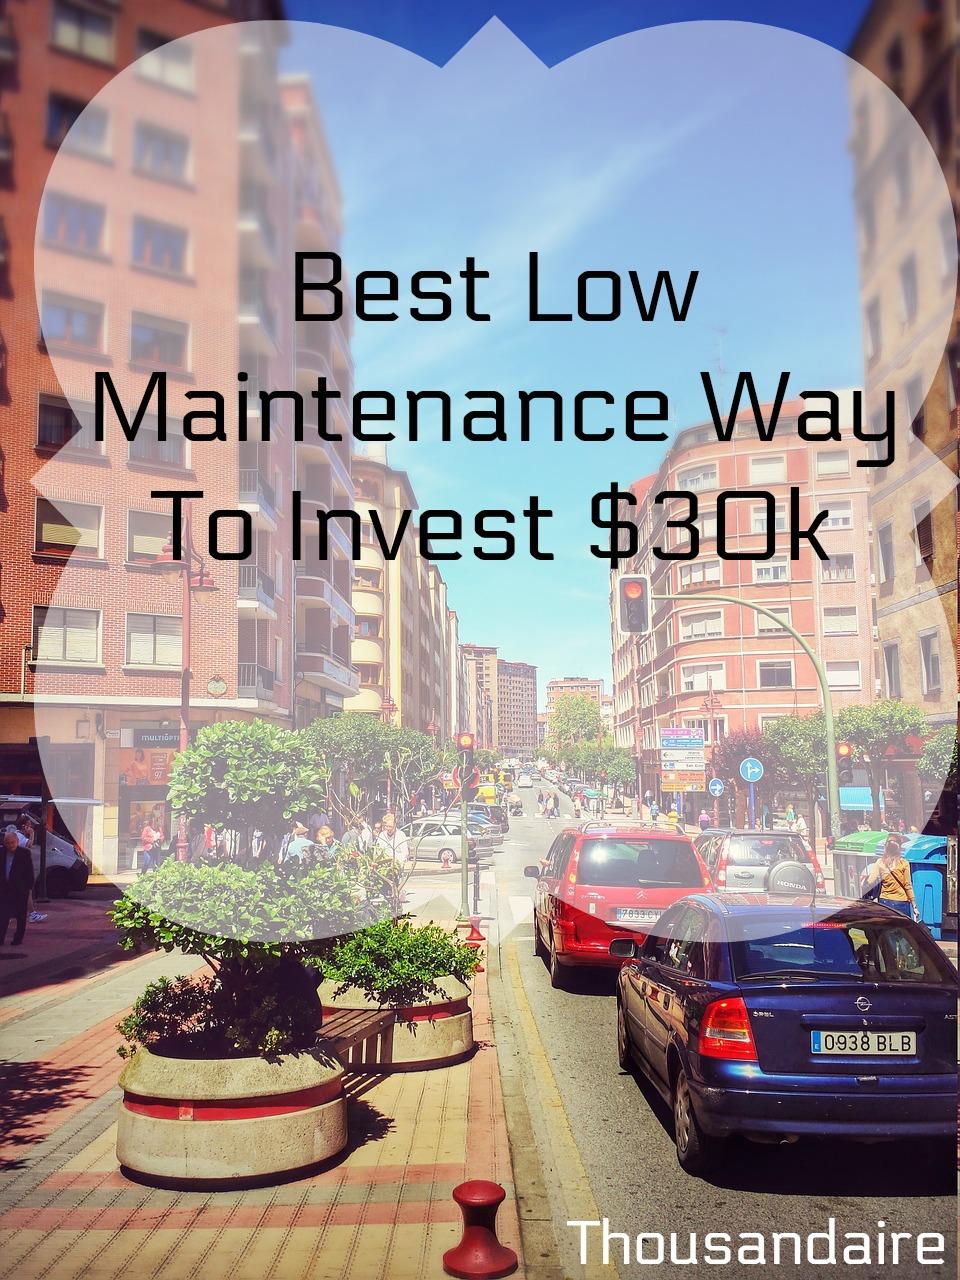 Best Low Maintenance Way To Invest $30k